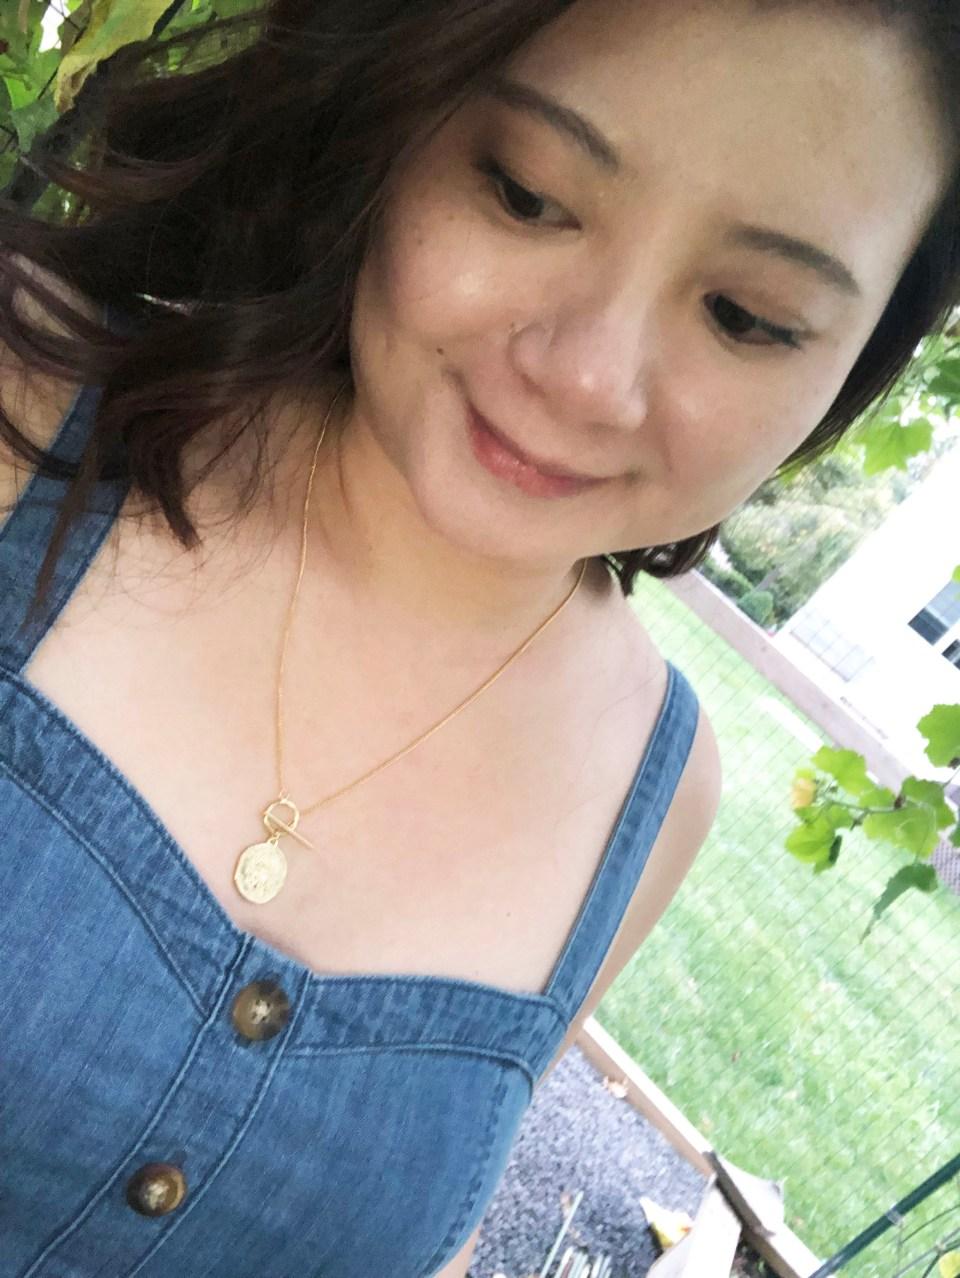 Denim Jumpsuit & Coin Toggle Necklace 15